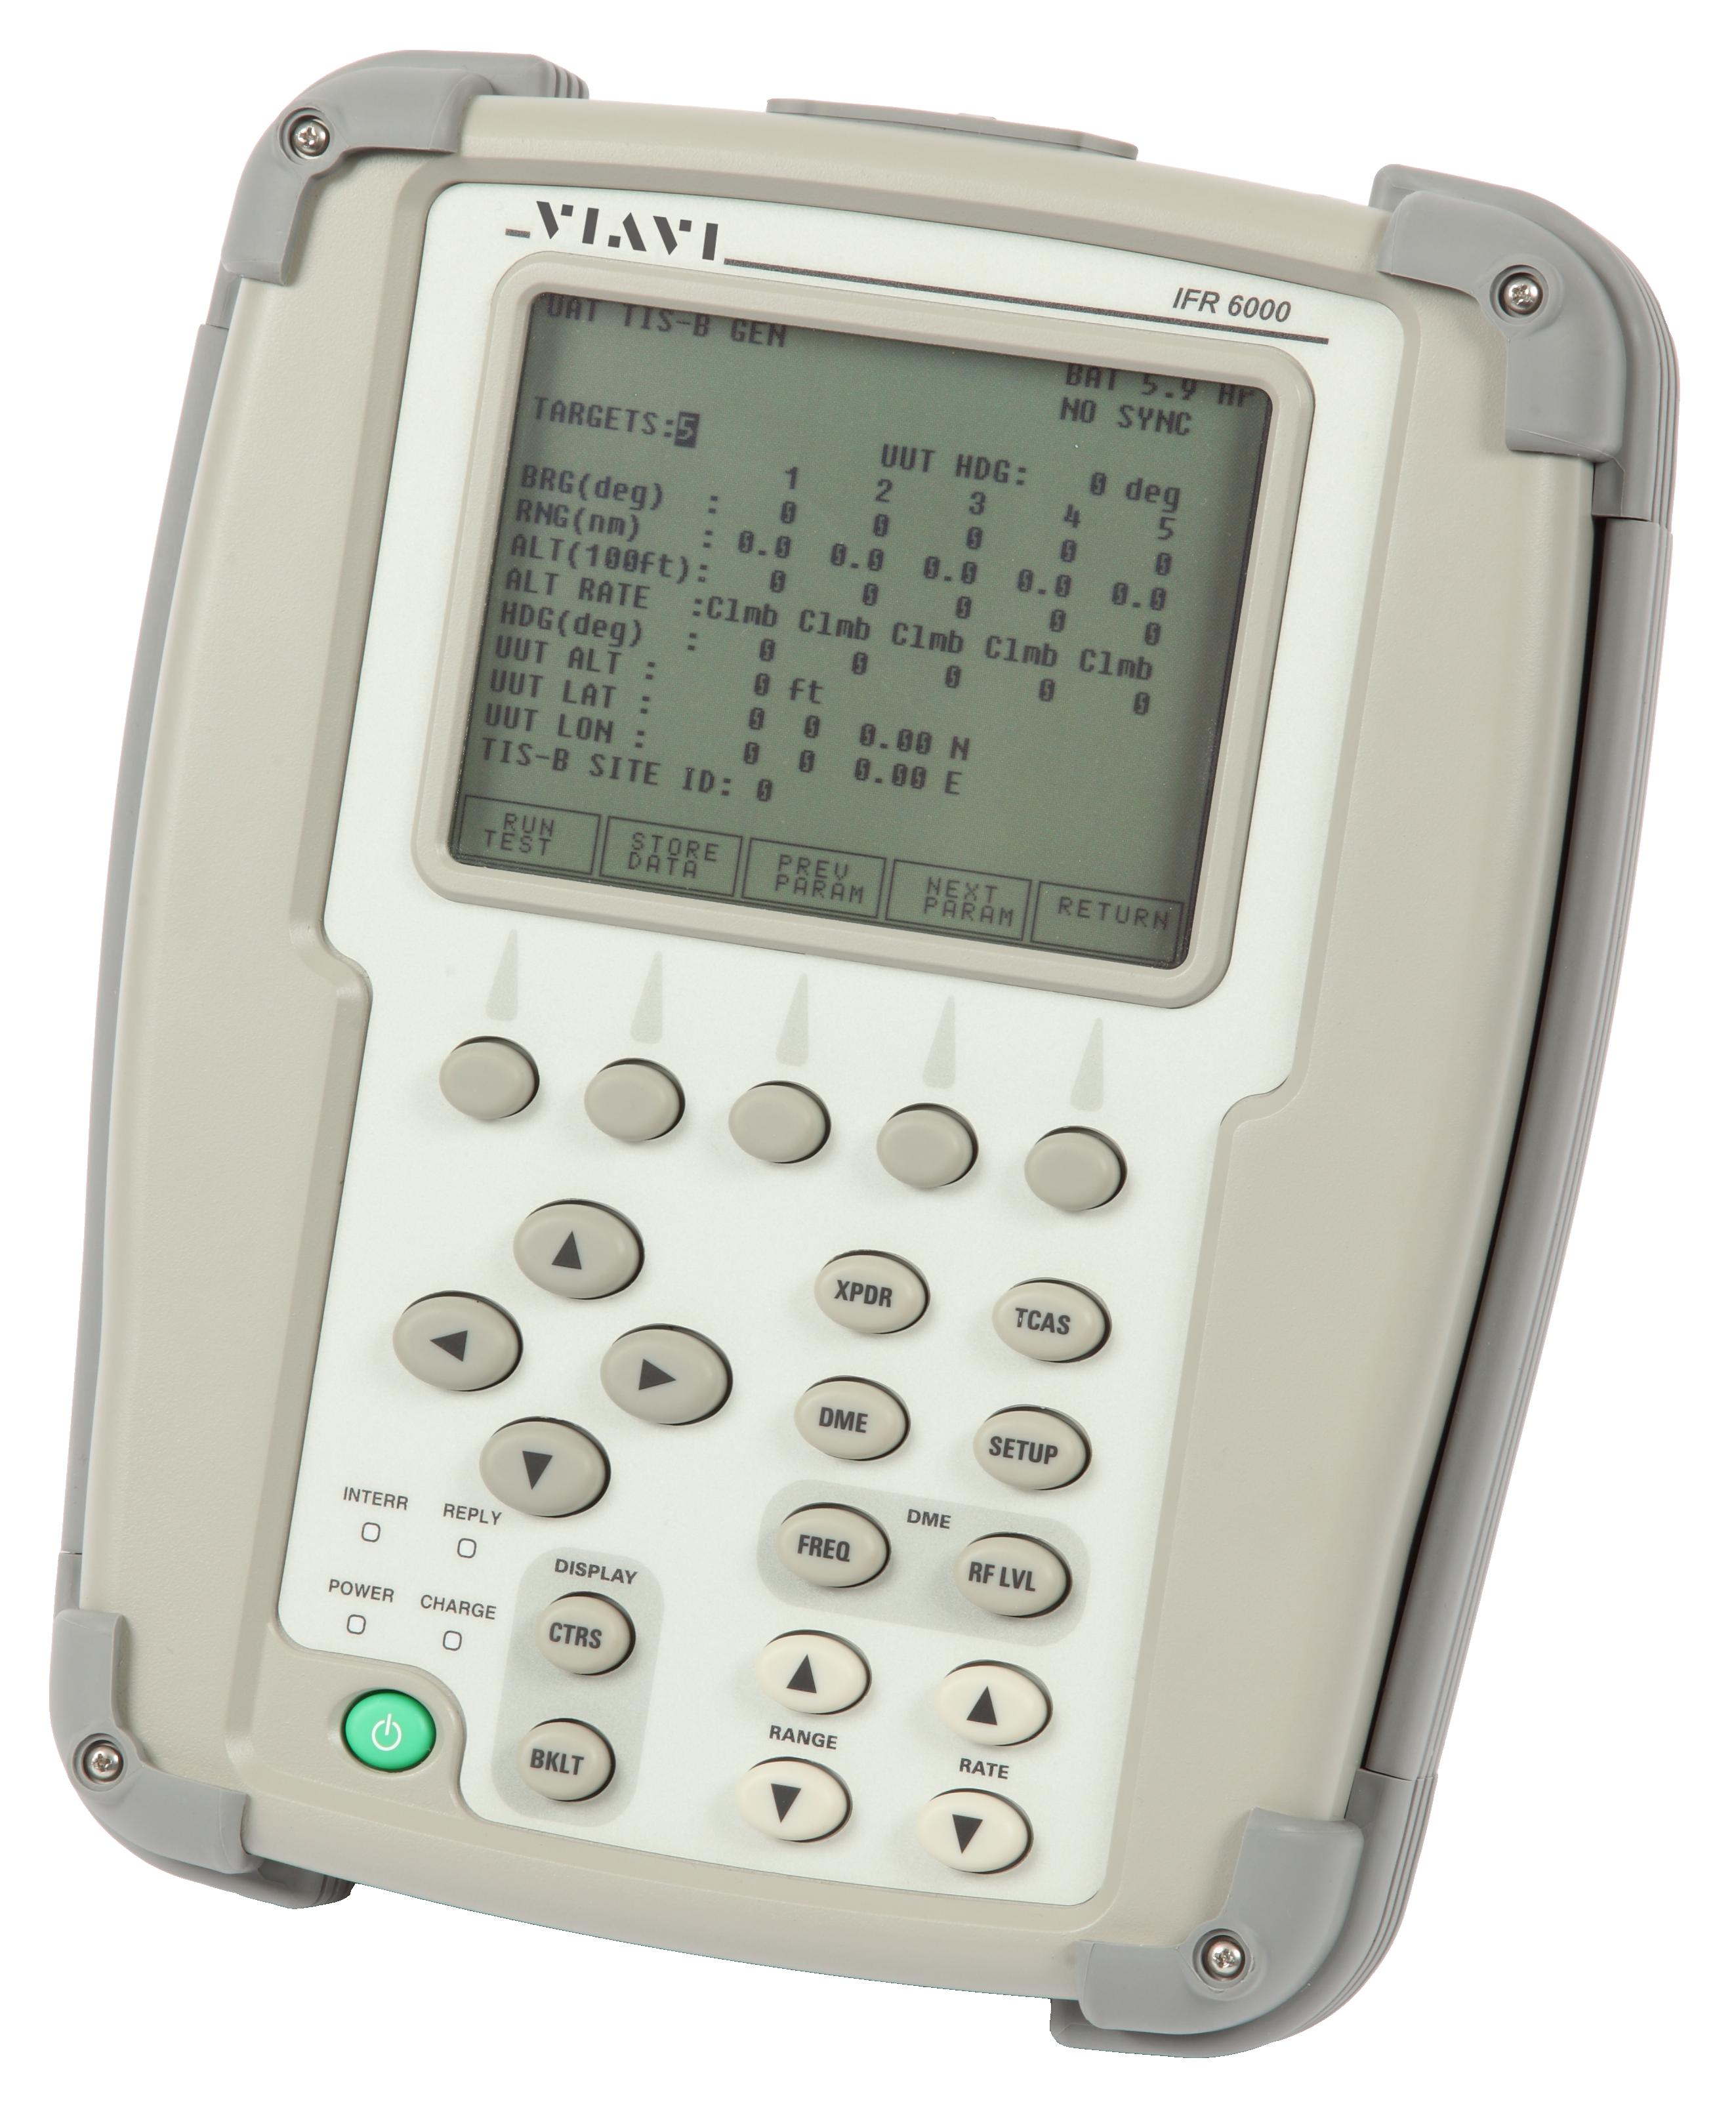 Ifr6000 Transponder Dme Tcas Flight Line Test Set Viavi Solutions Inc Warn Mx 6000 Wiring Diagram